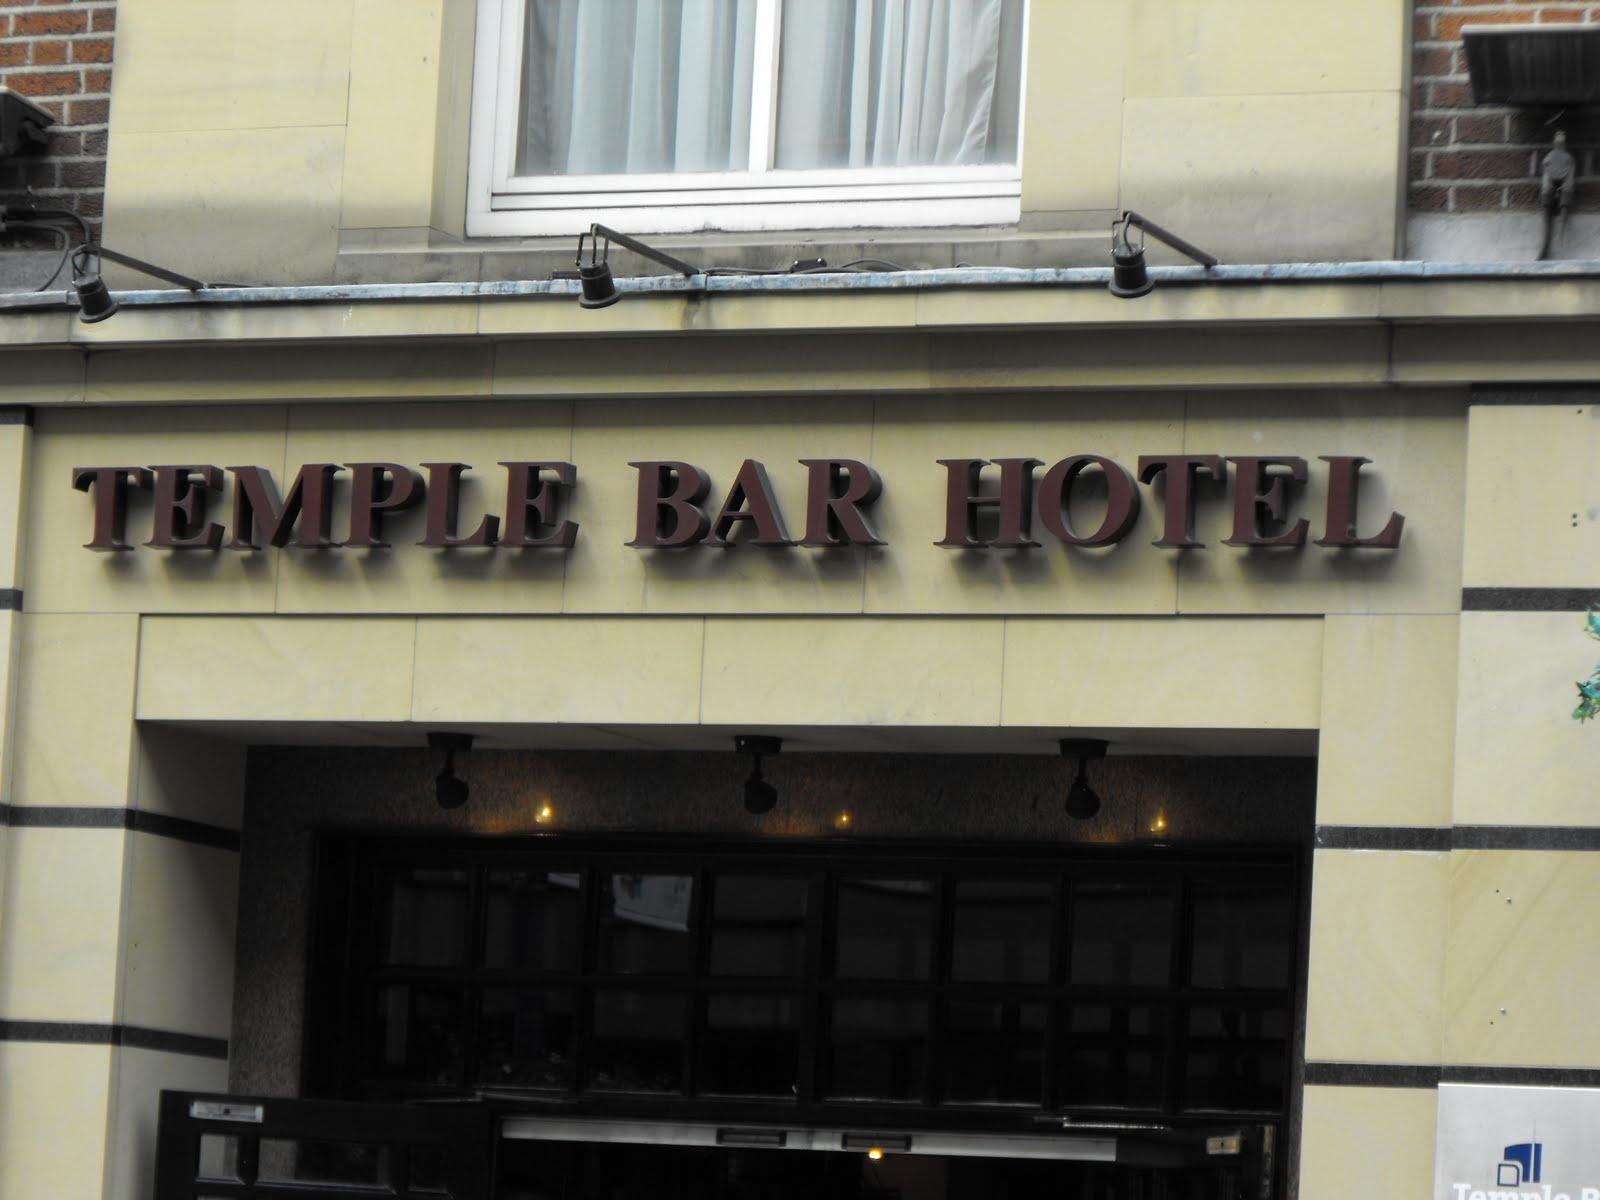 temple bar dublin temple bar hotel temple bar dublin. Black Bedroom Furniture Sets. Home Design Ideas